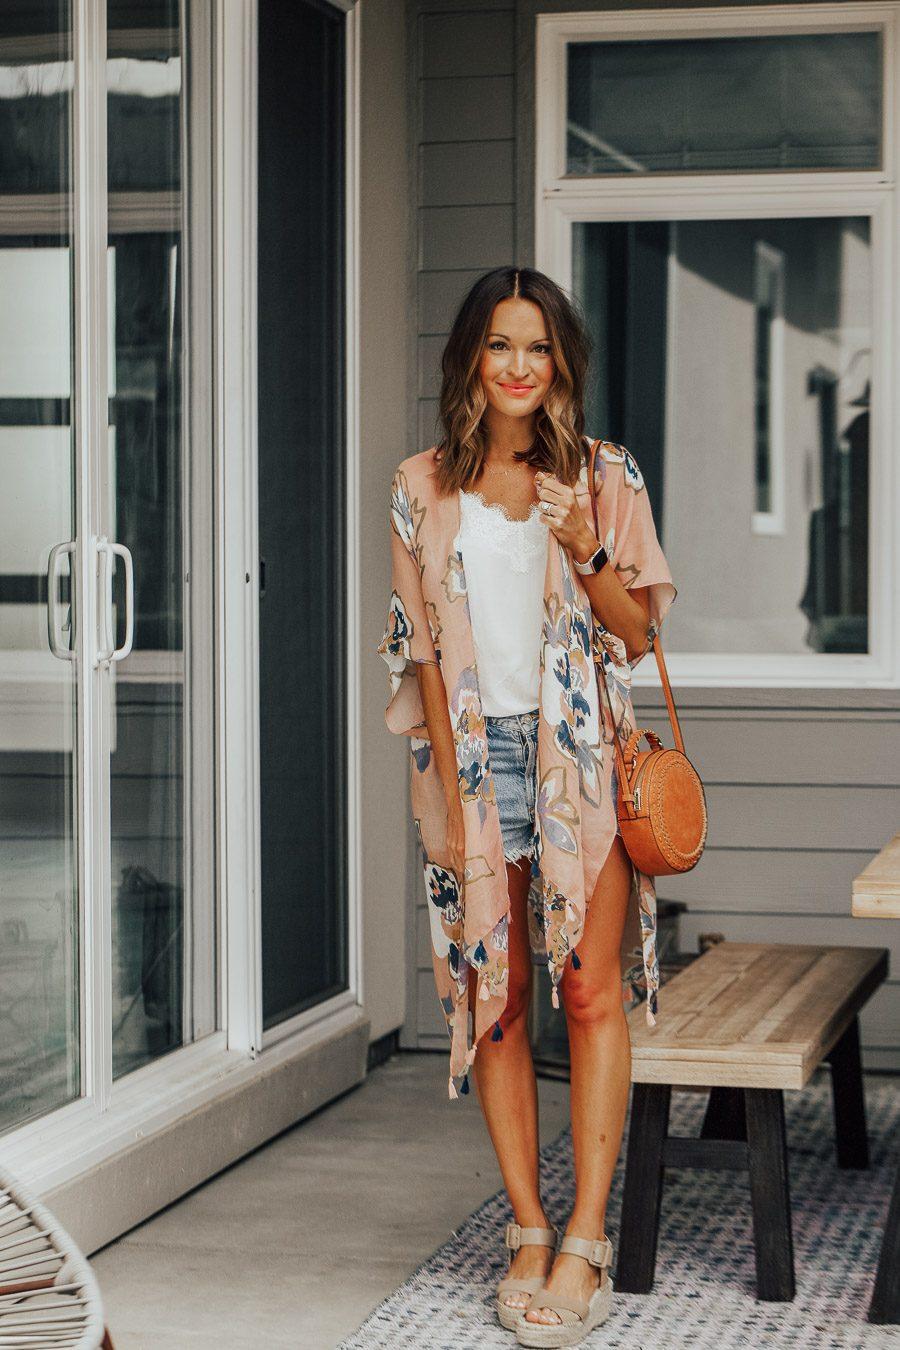 Laurenkaysims mặc áo hai dây, quần shorts, áo kimono